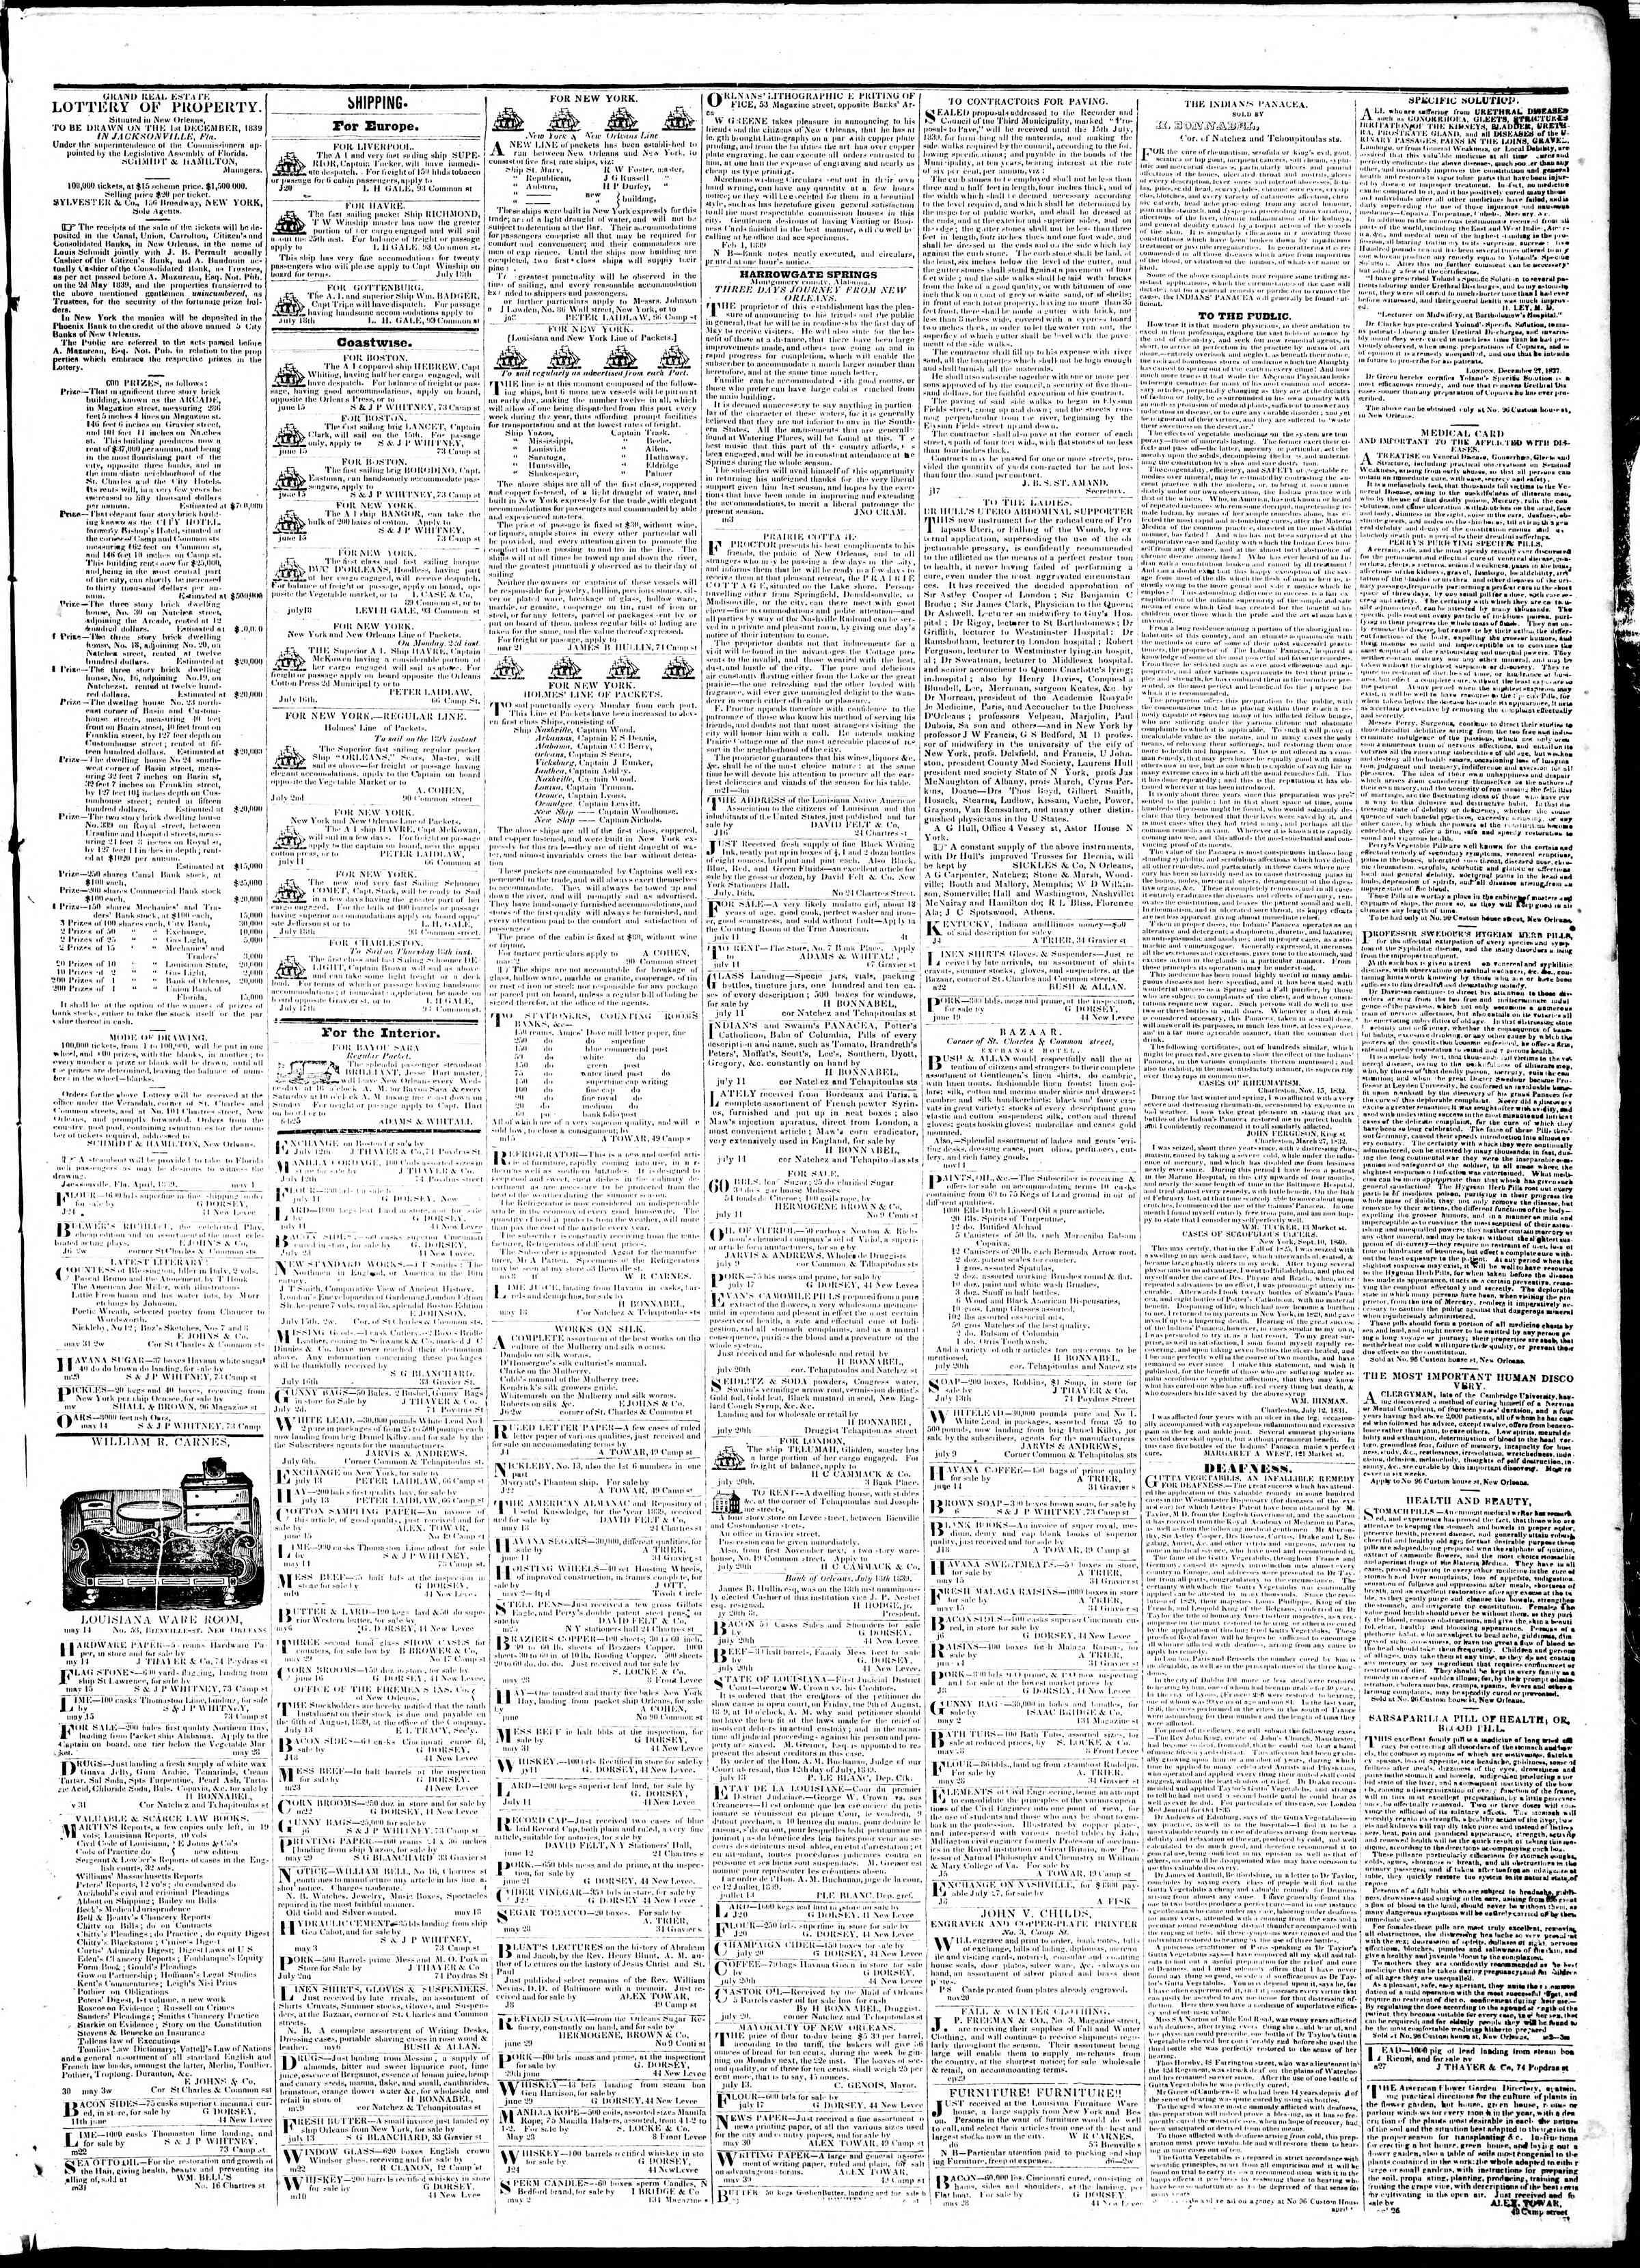 July 23, 1839 Tarihli True American Gazetesi Sayfa 3